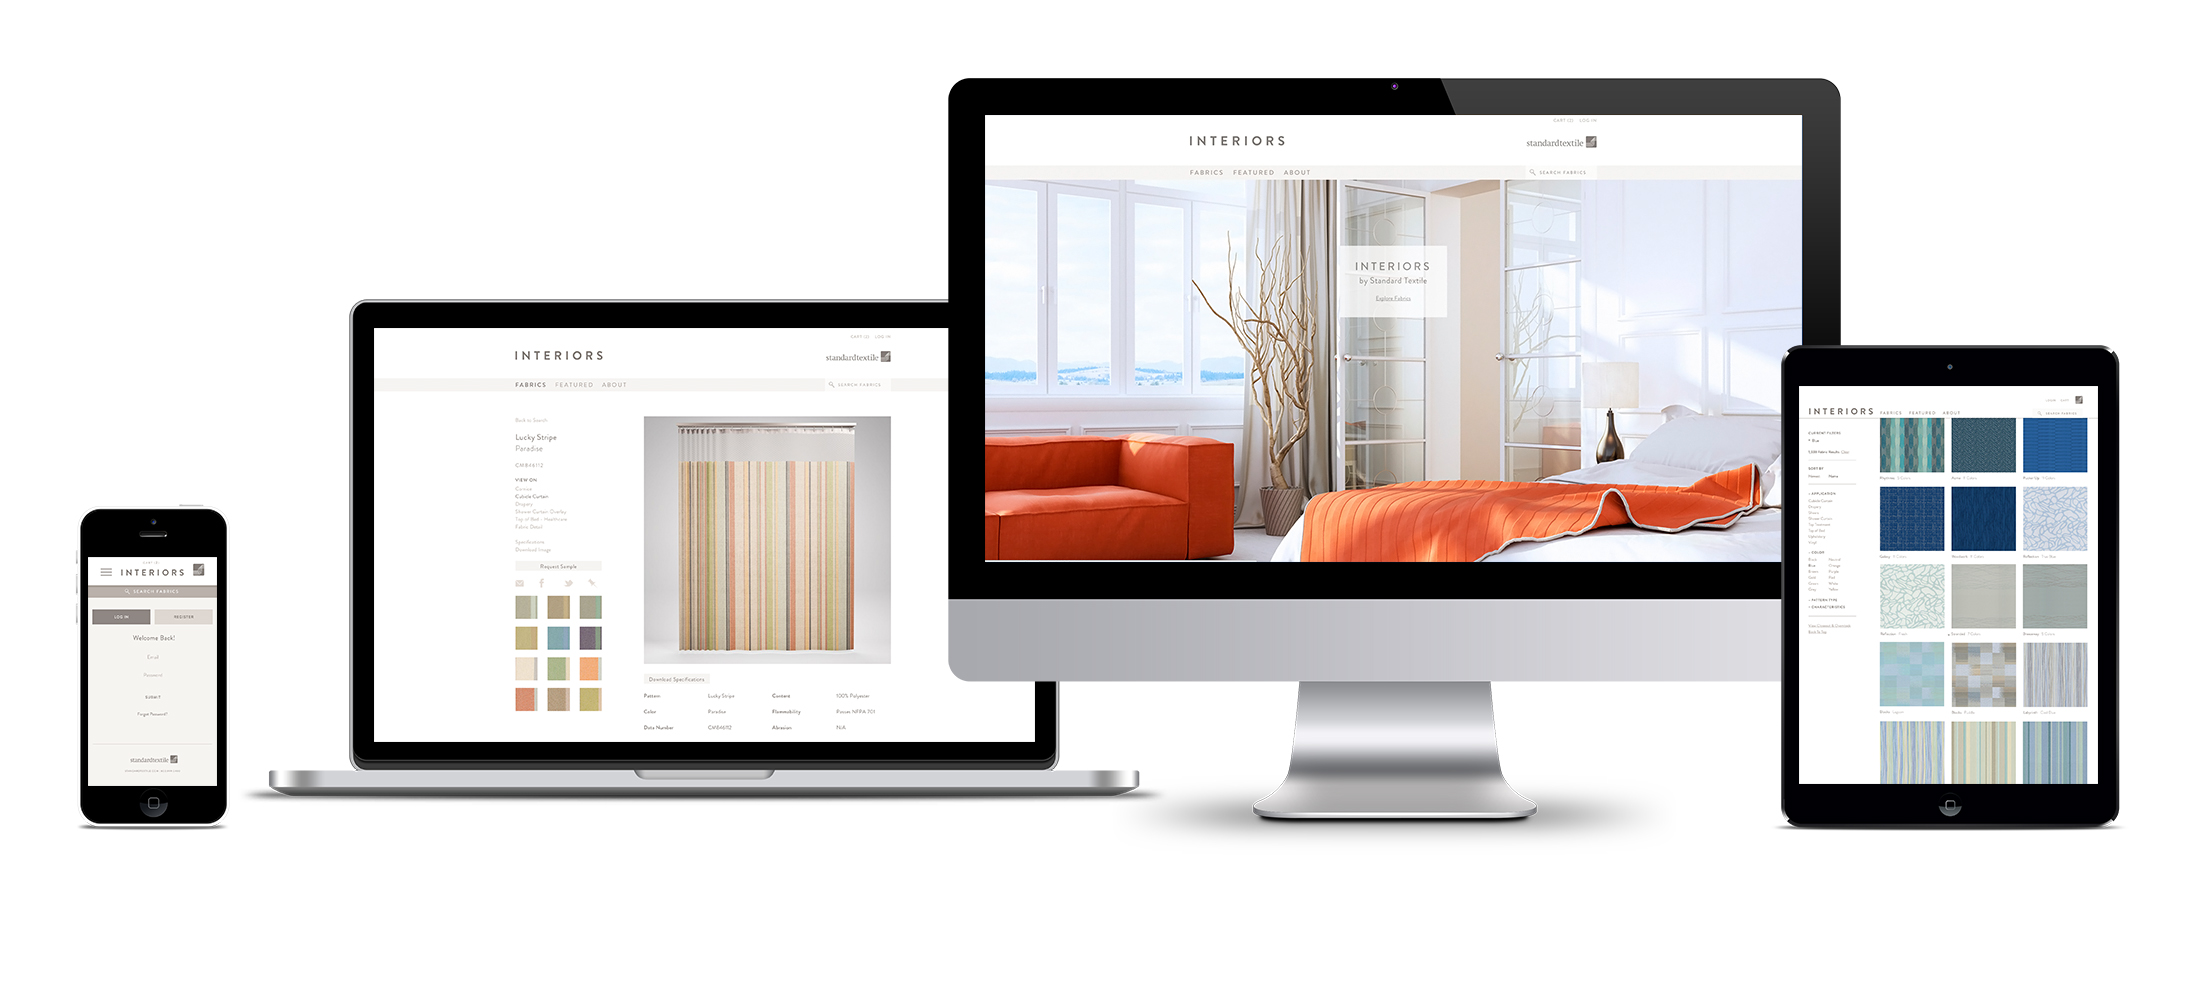 interiors_responsive.jpg